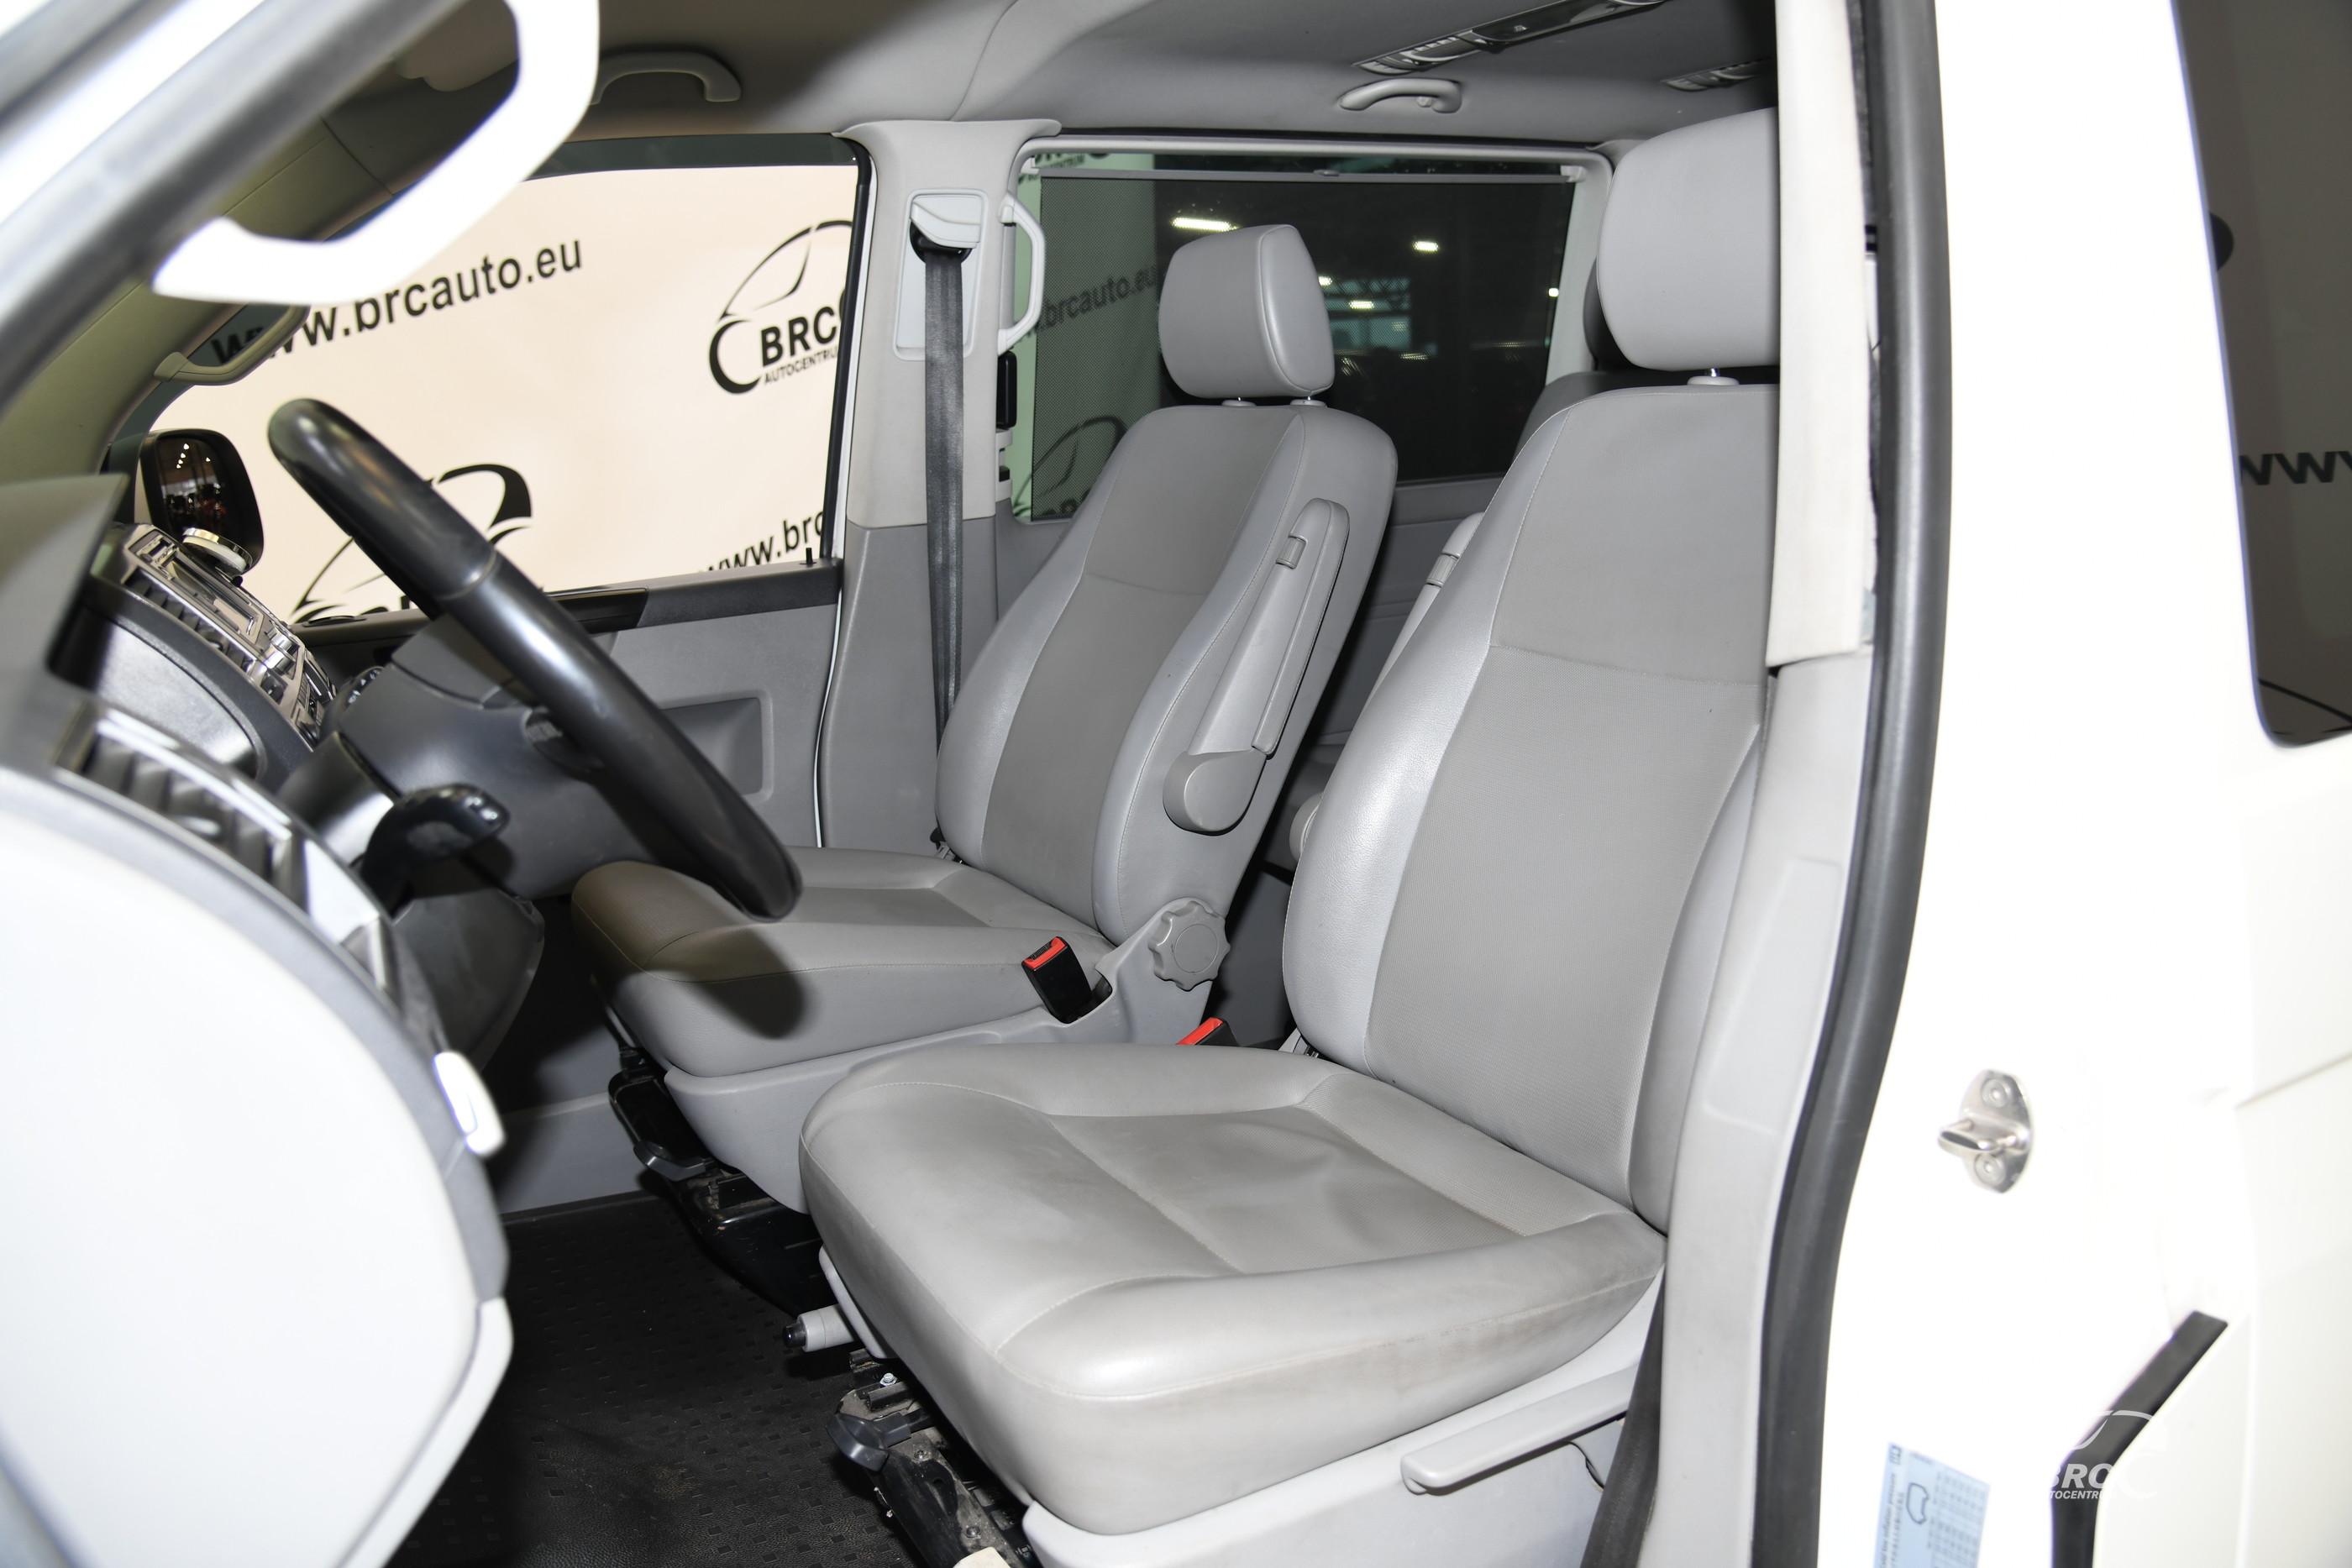 Volkswagen Caravelle 2.0 TDI 4Motion DSG Automatas